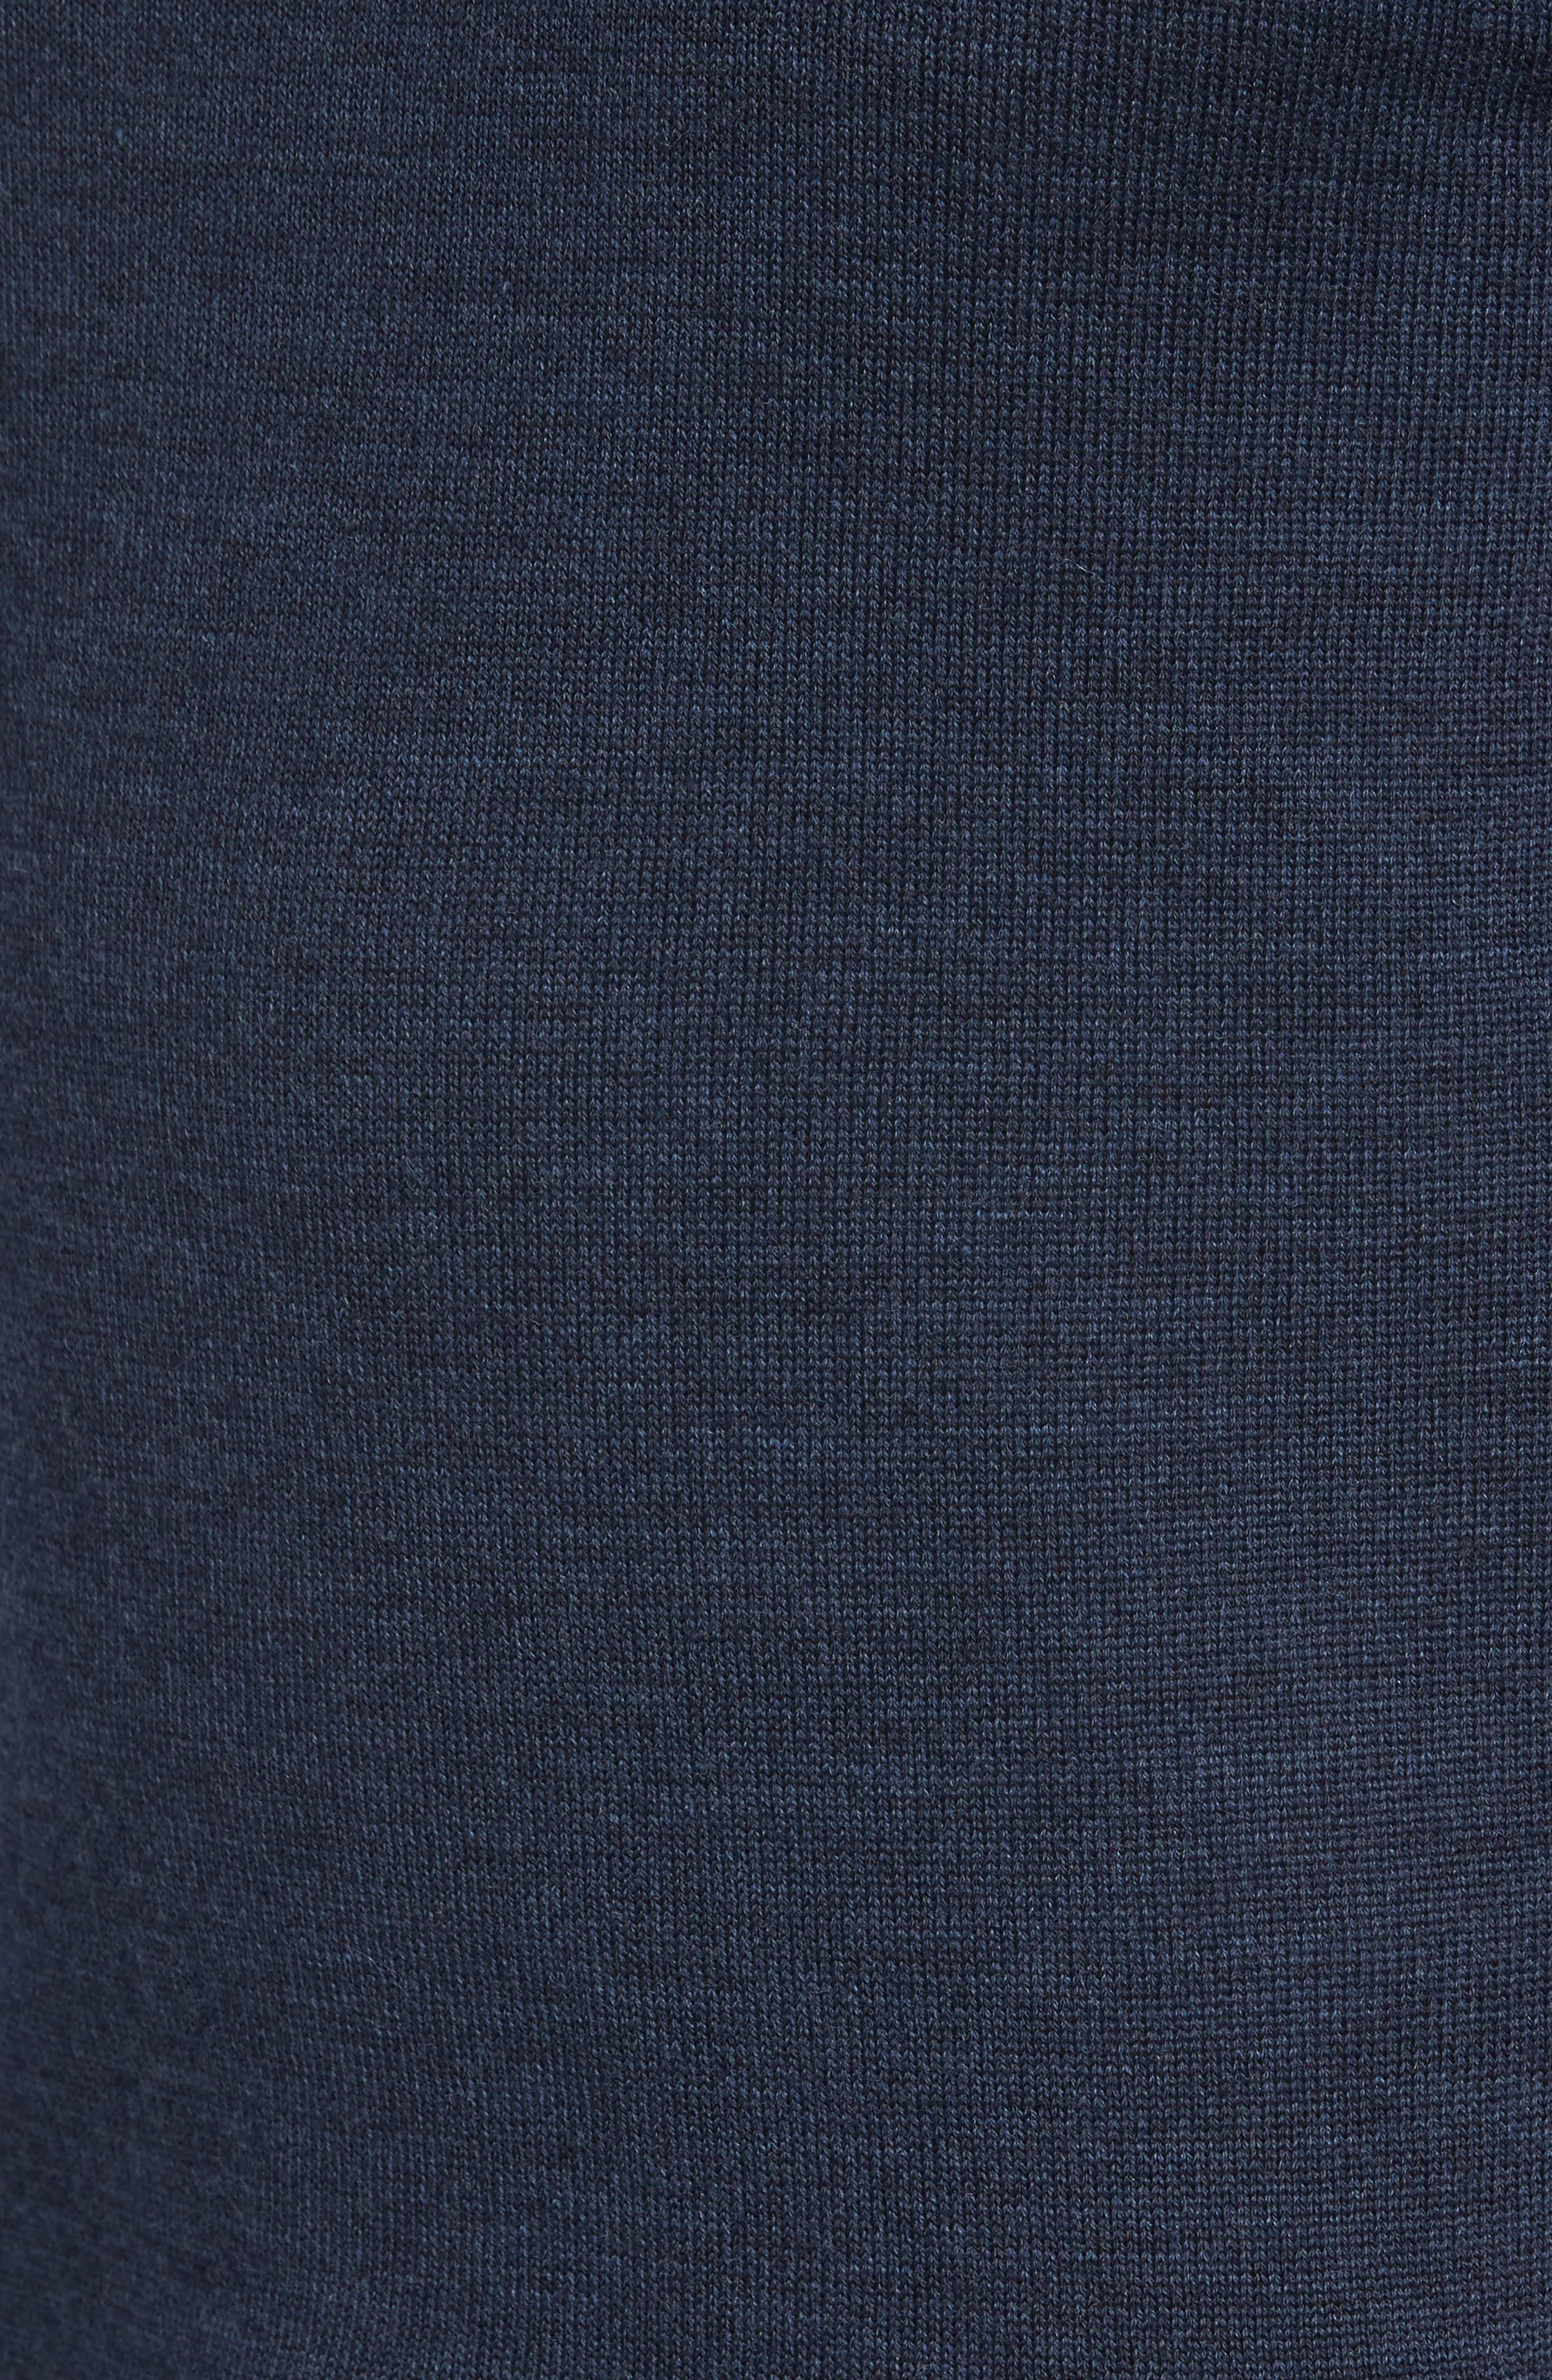 Alternate Image 5  - Rodd & Gunn Bannockburn Mélange Merino Wool Sweater